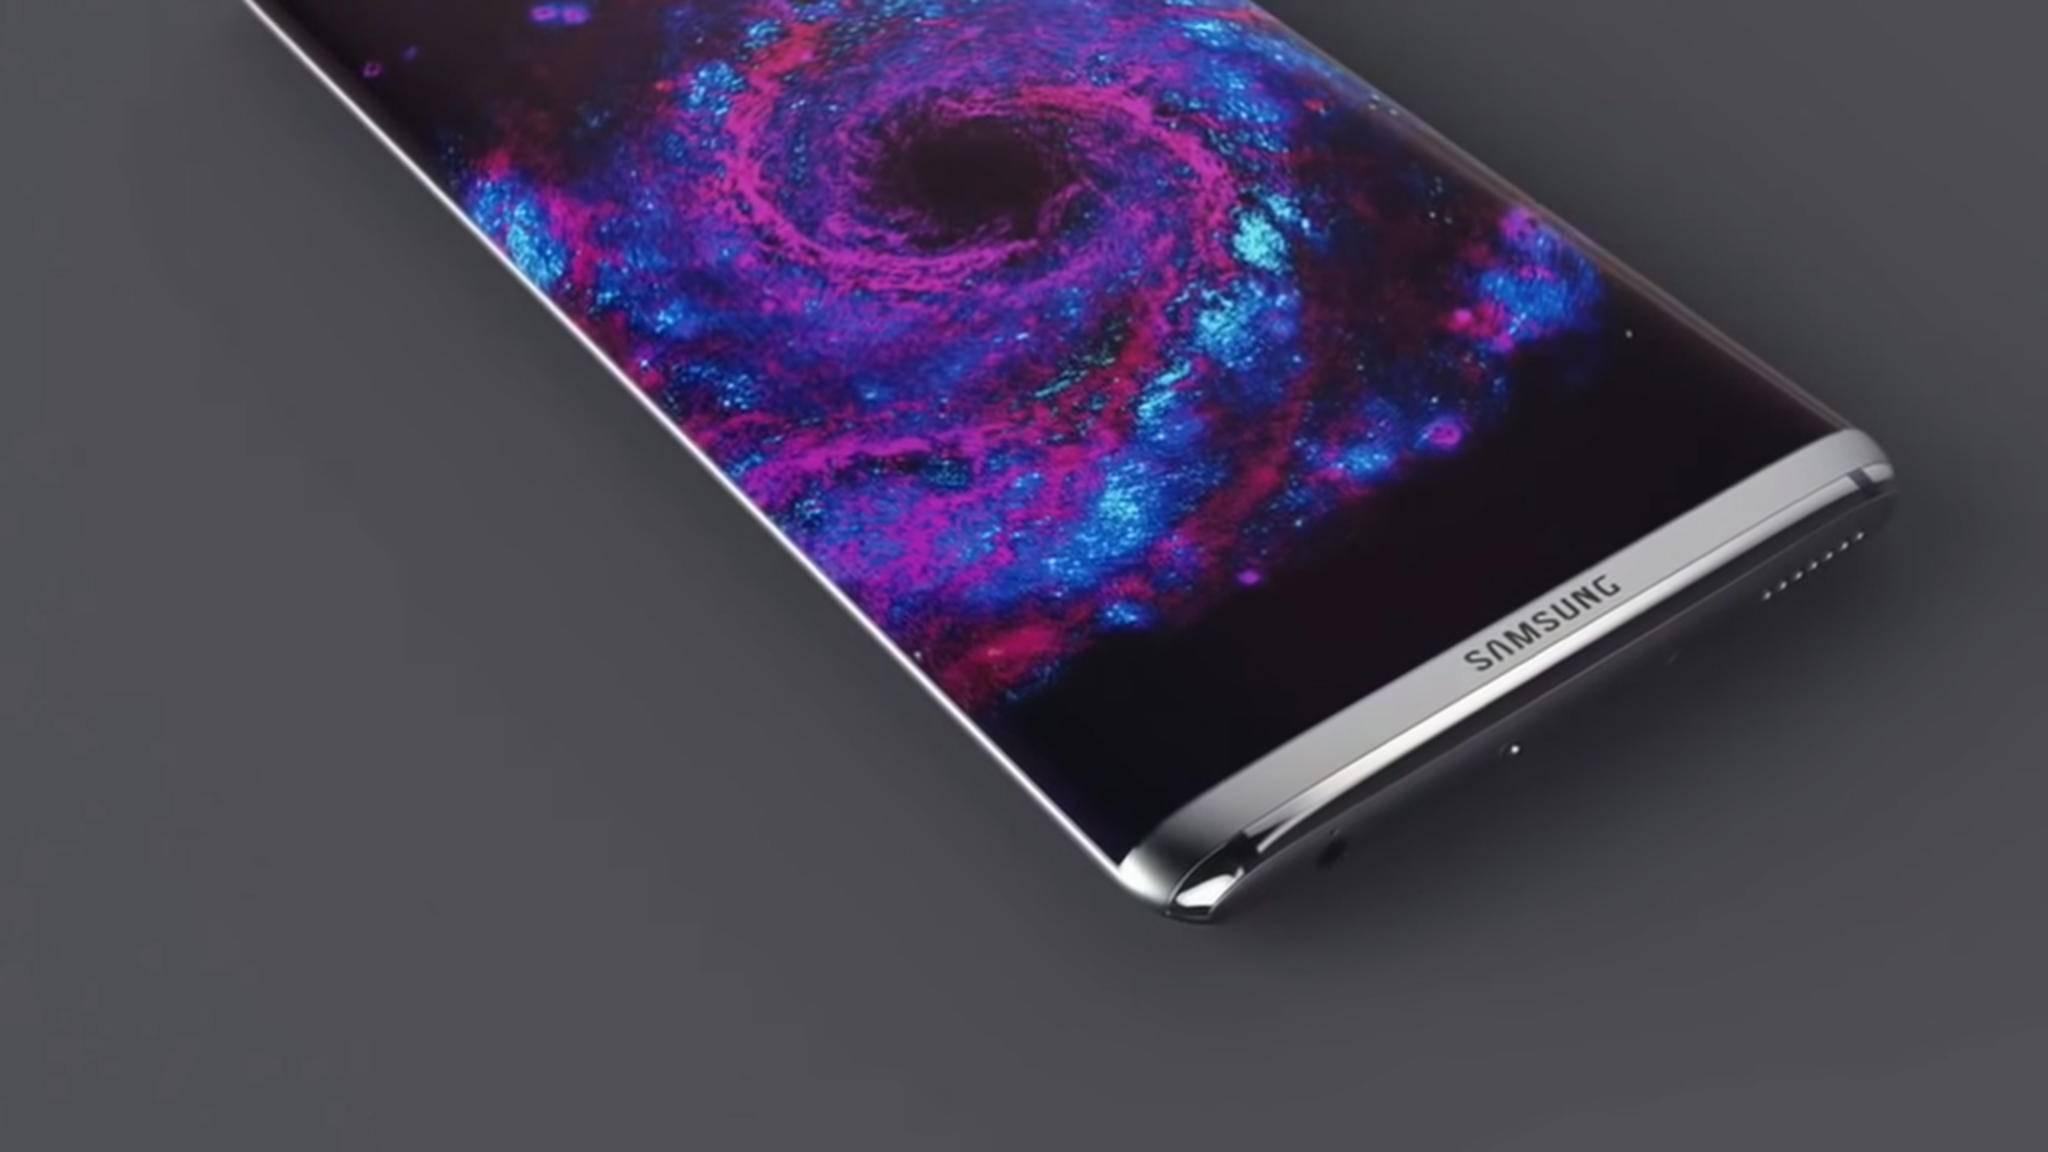 Bekommt das Galaxy S8 einen ultrascharfen 4K-Bildschirm?